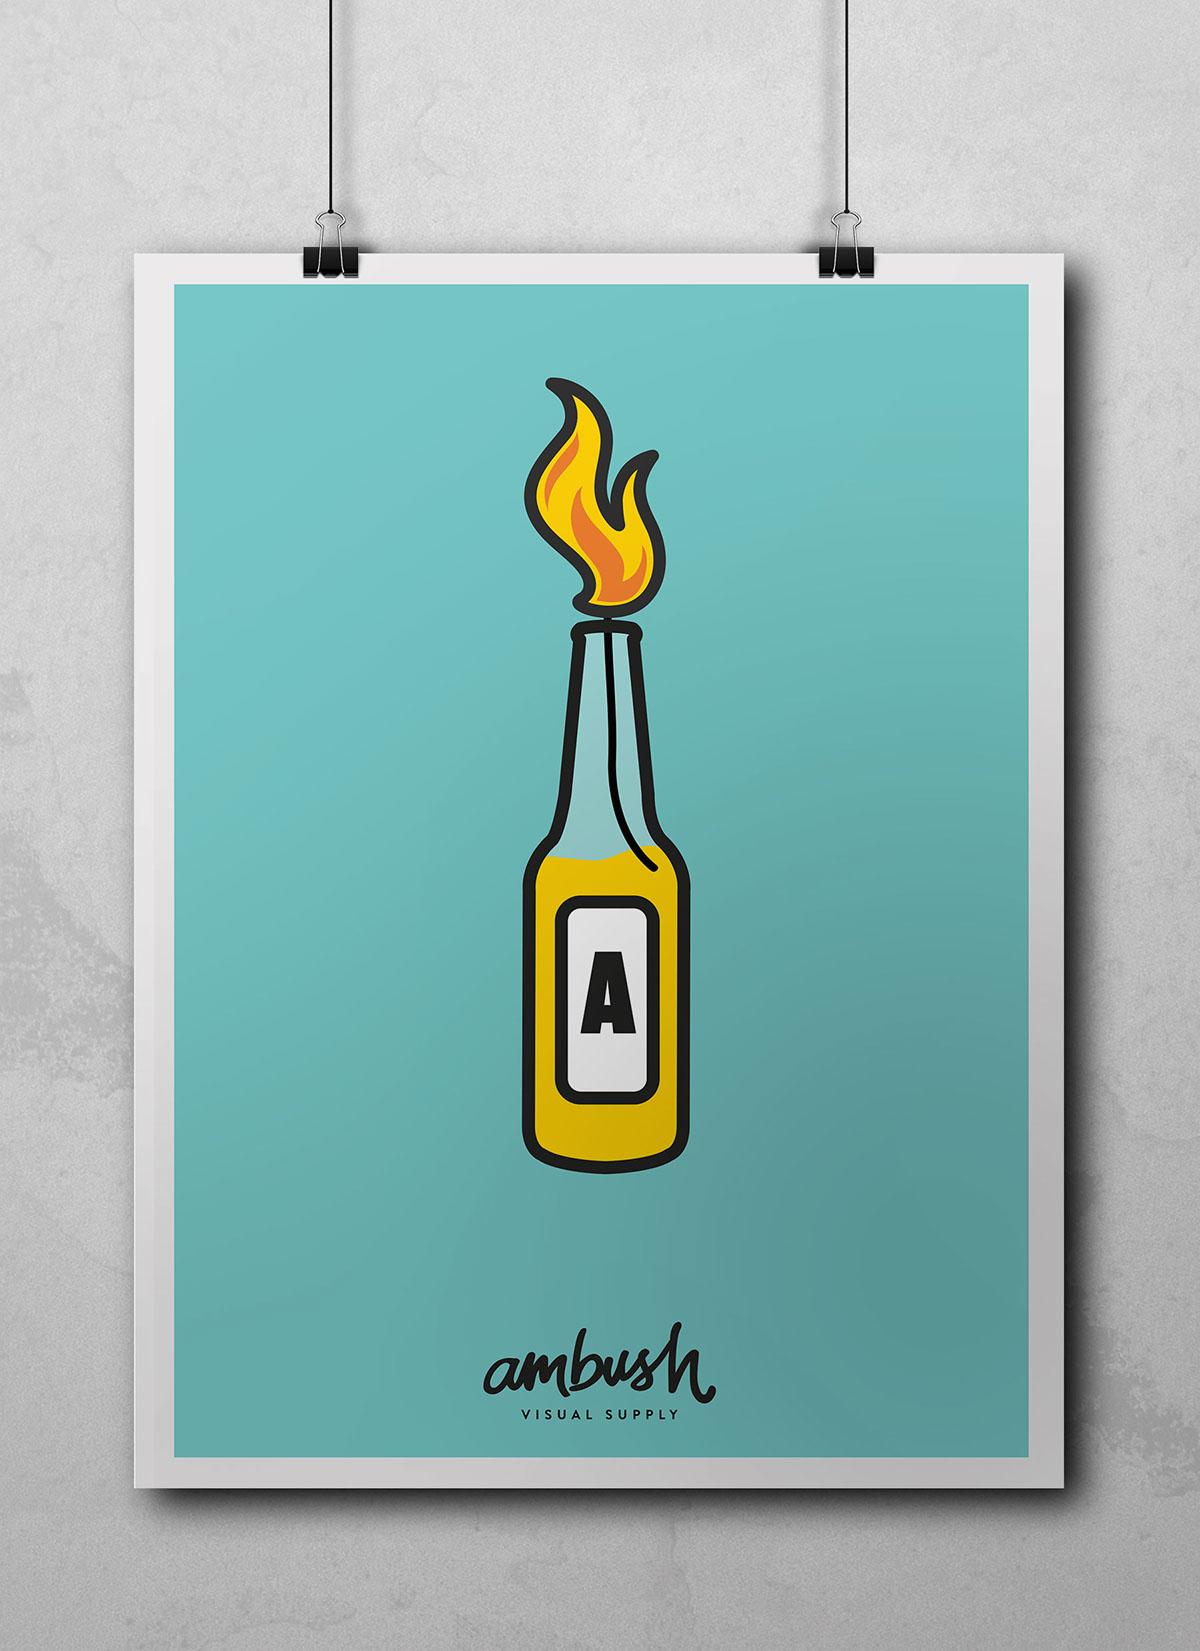 Ambush posters bottle molotov Icon supply